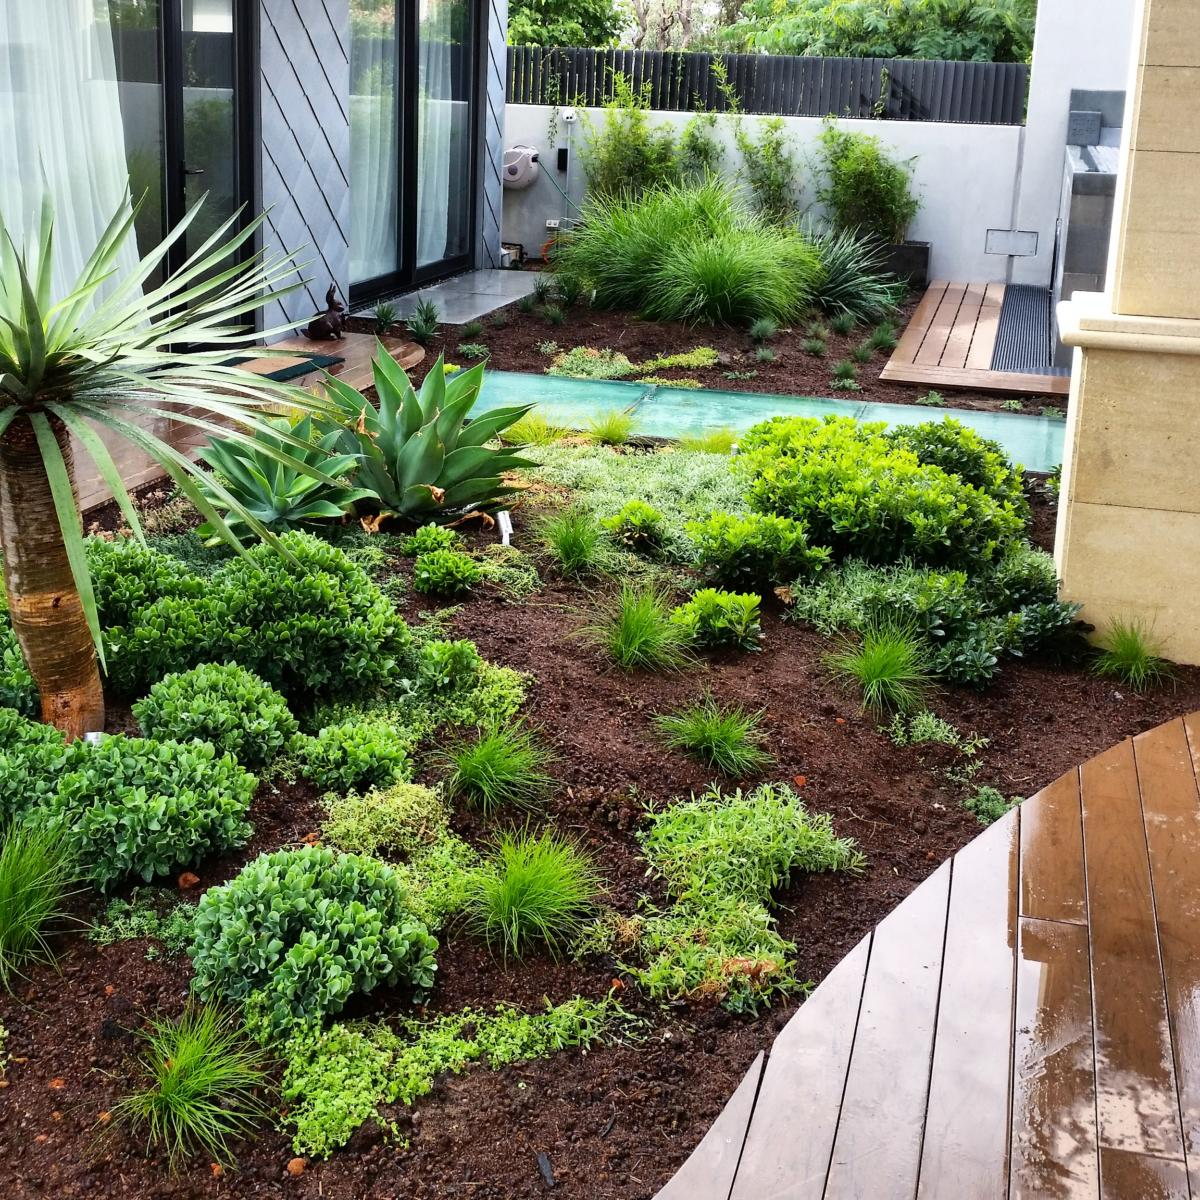 Sj Landscapes And Gardening Services: Mitchs Gardening: Perth Garden Maintenance Company